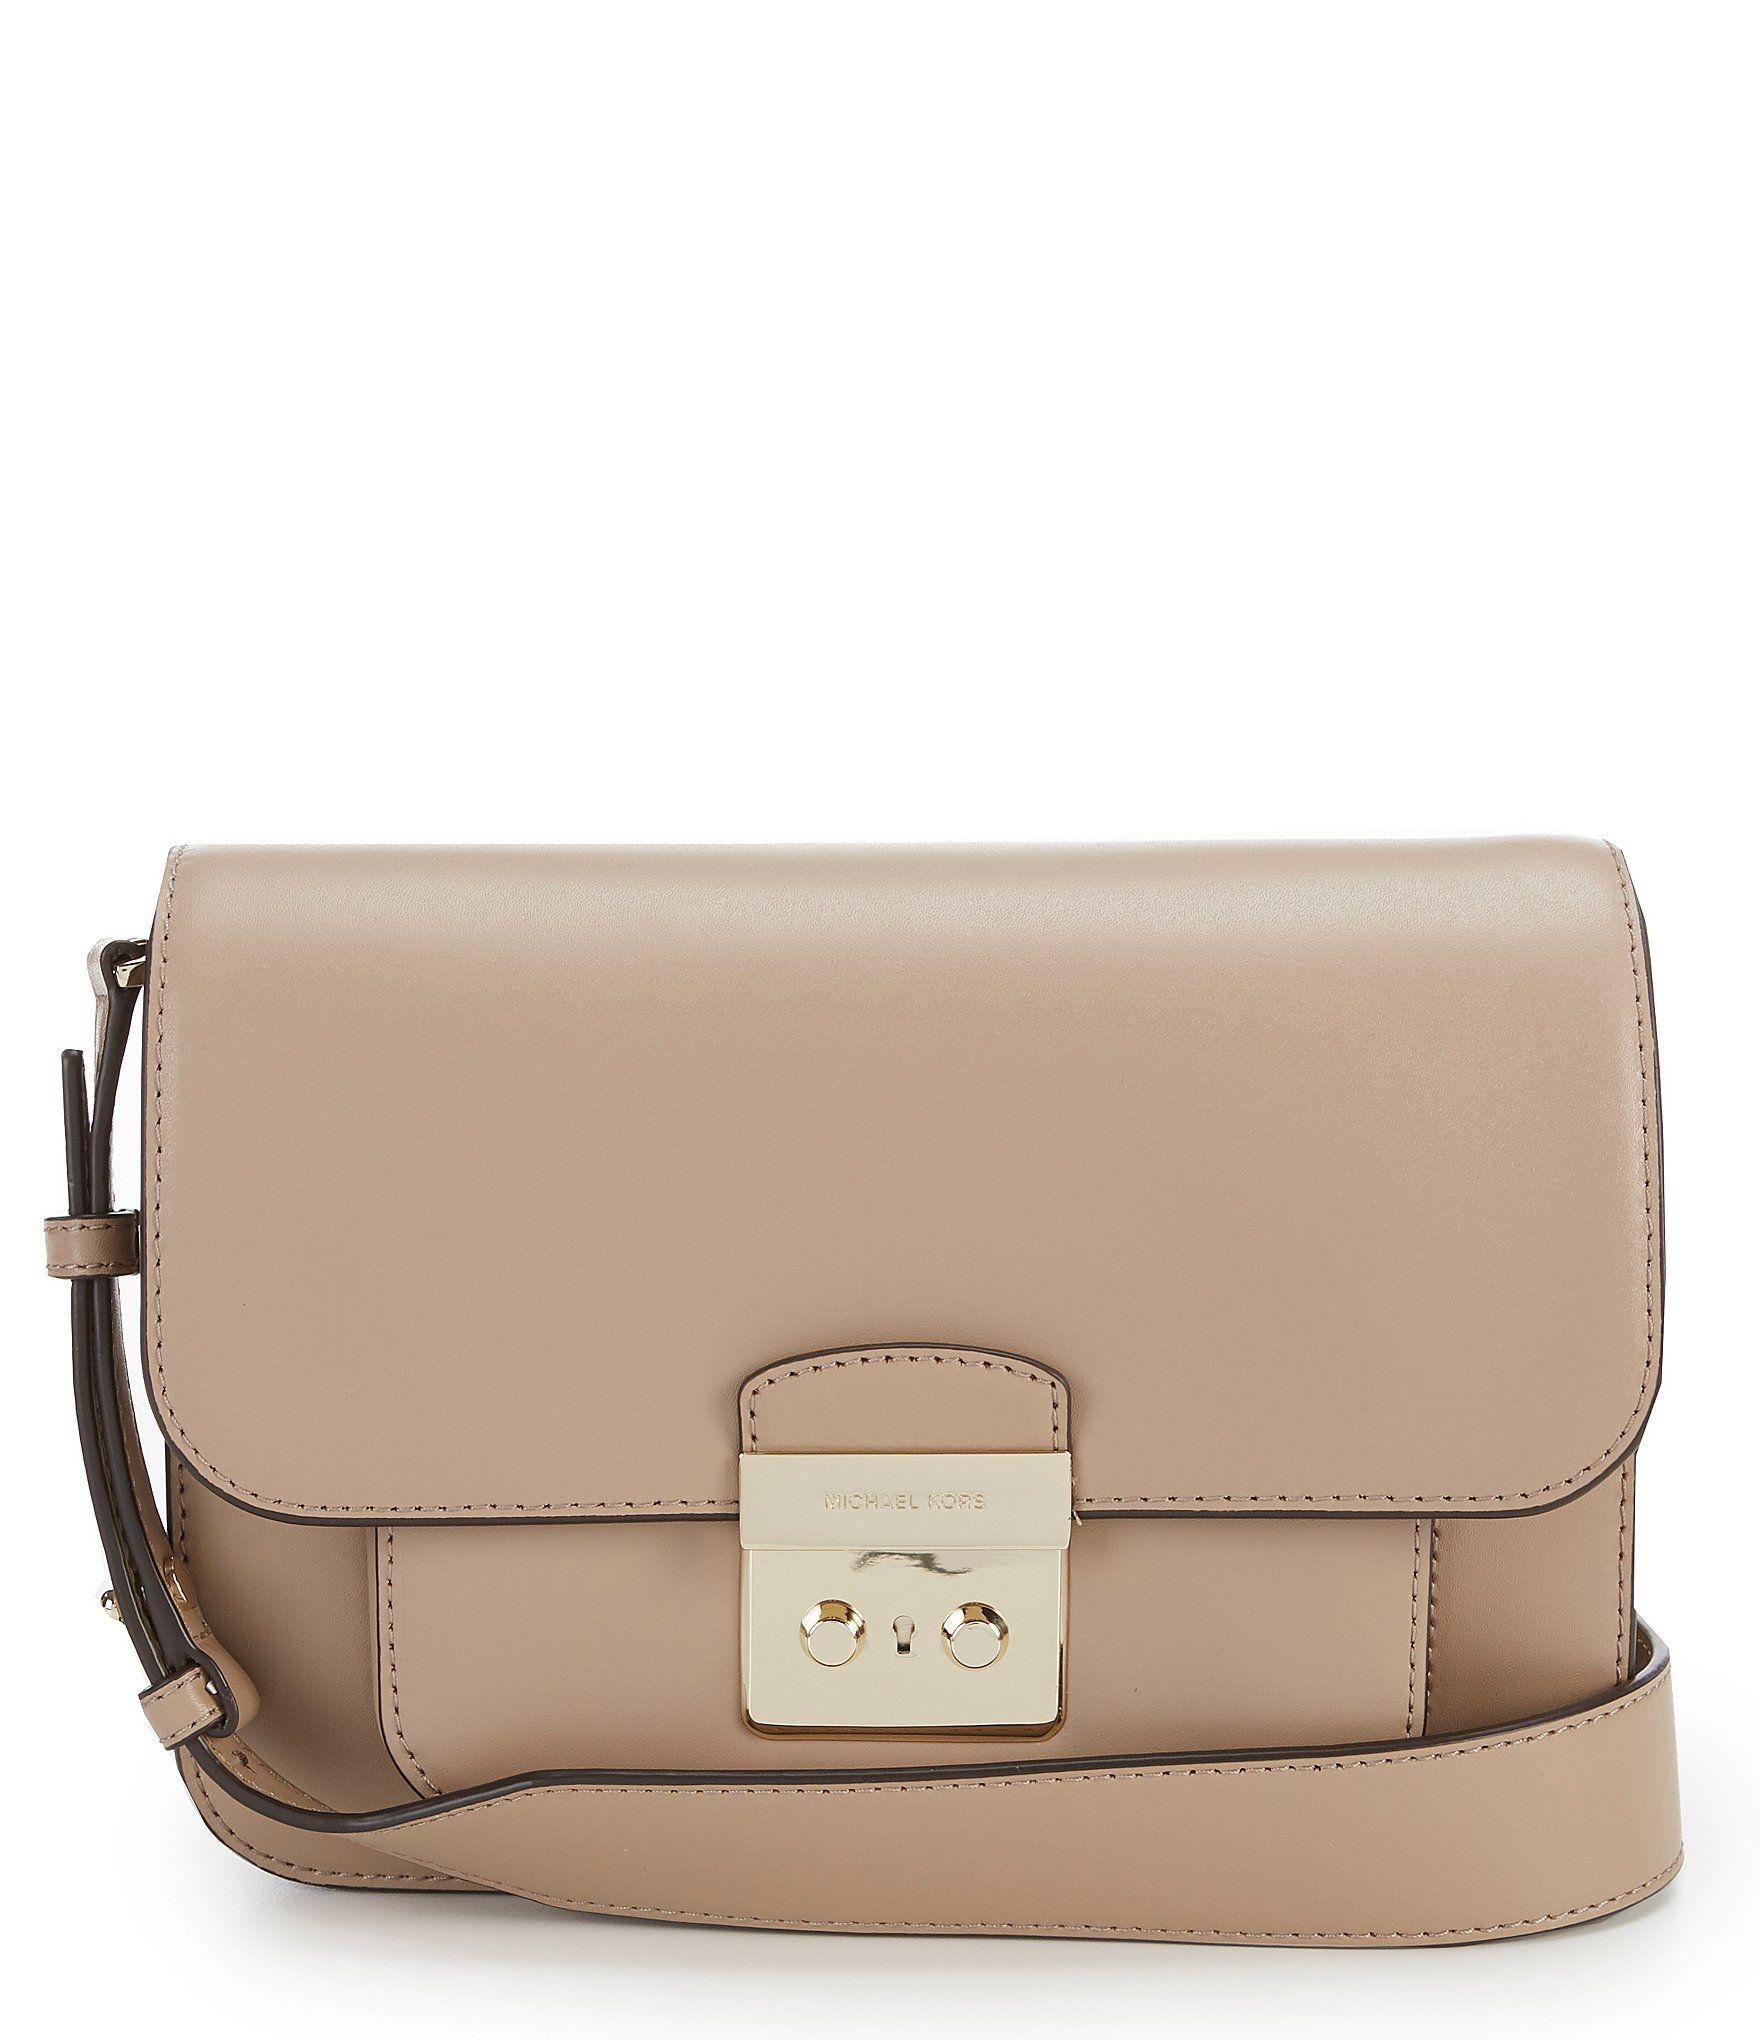 f3cd9024687b Shop for MICHAEL Michael Kors Sloan Editor Large Shoulder Bag at  Dillards.com. Visit Dillards.com to find clothing, accessories, shoes,  cosmetics & more.